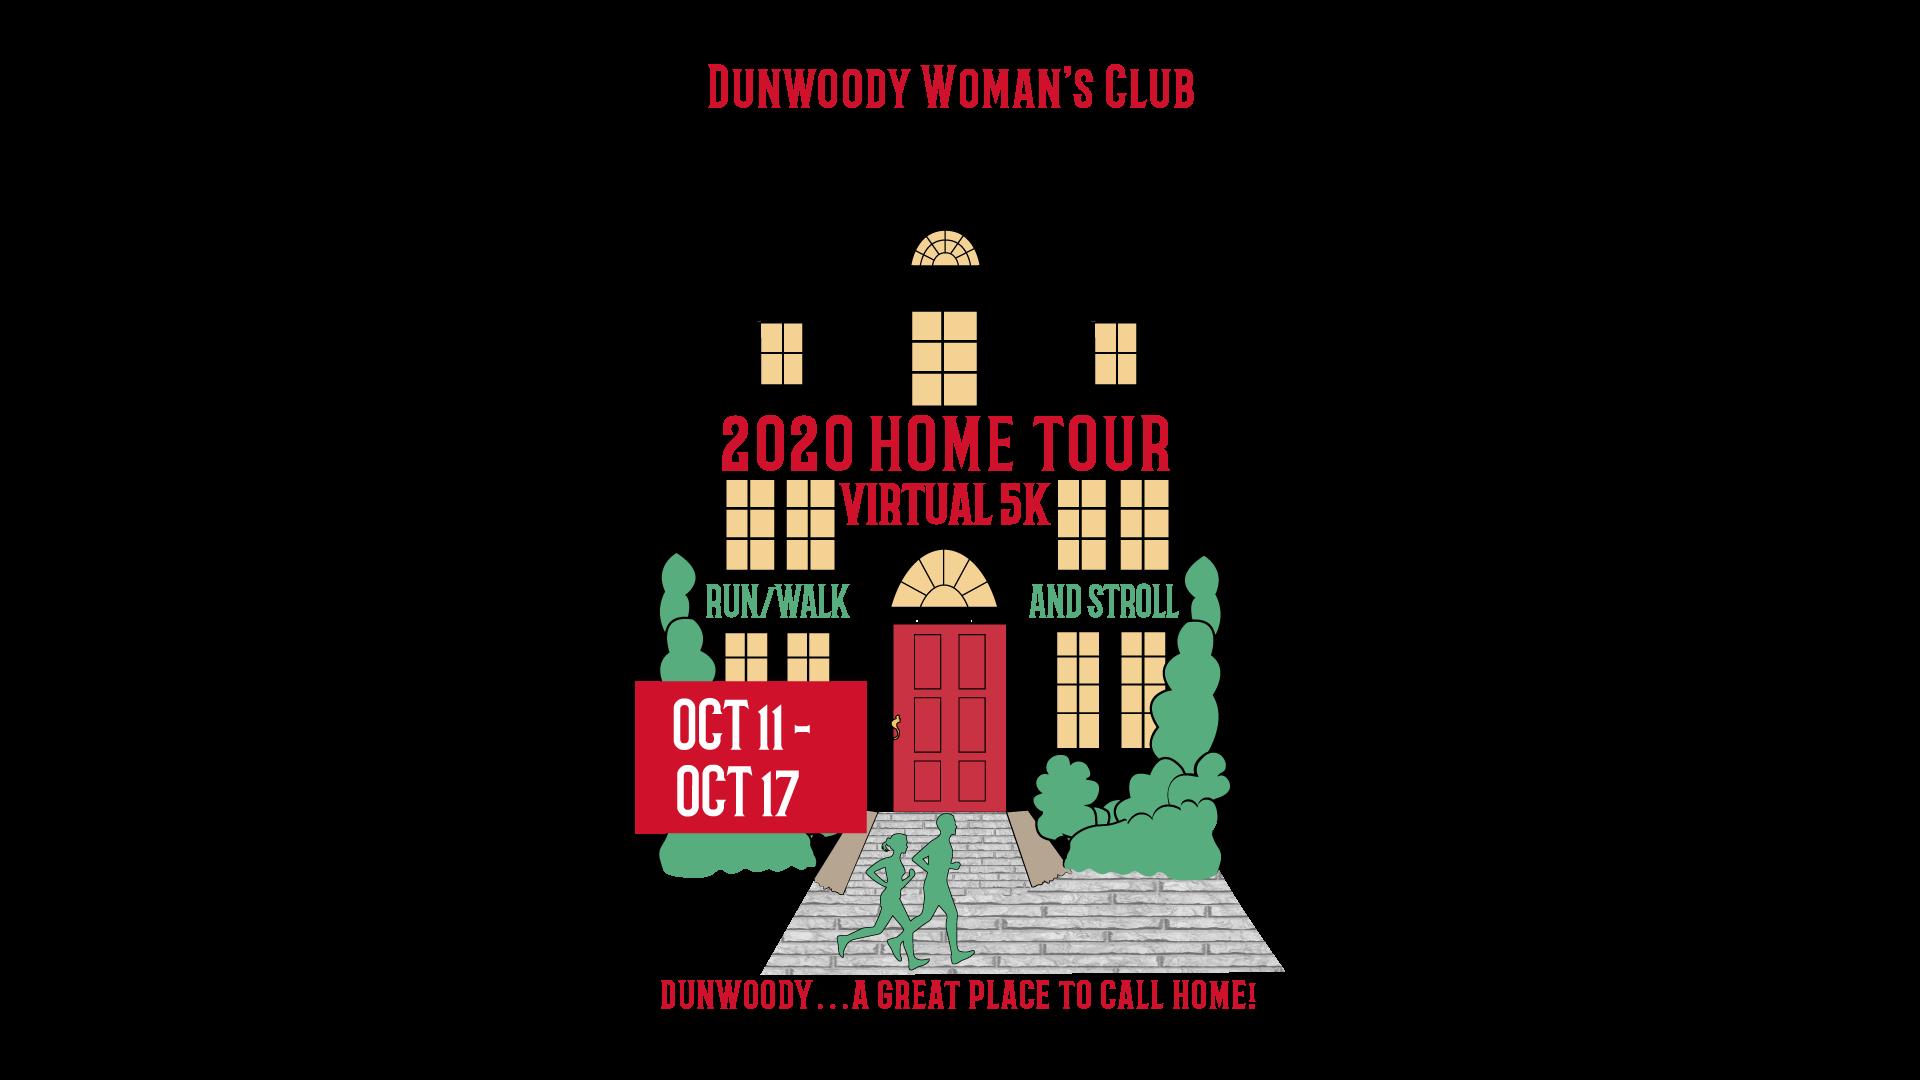 Dunwoody Woman's Club 2020 Home Tour Virtual 5K Run/Walk and Stroll